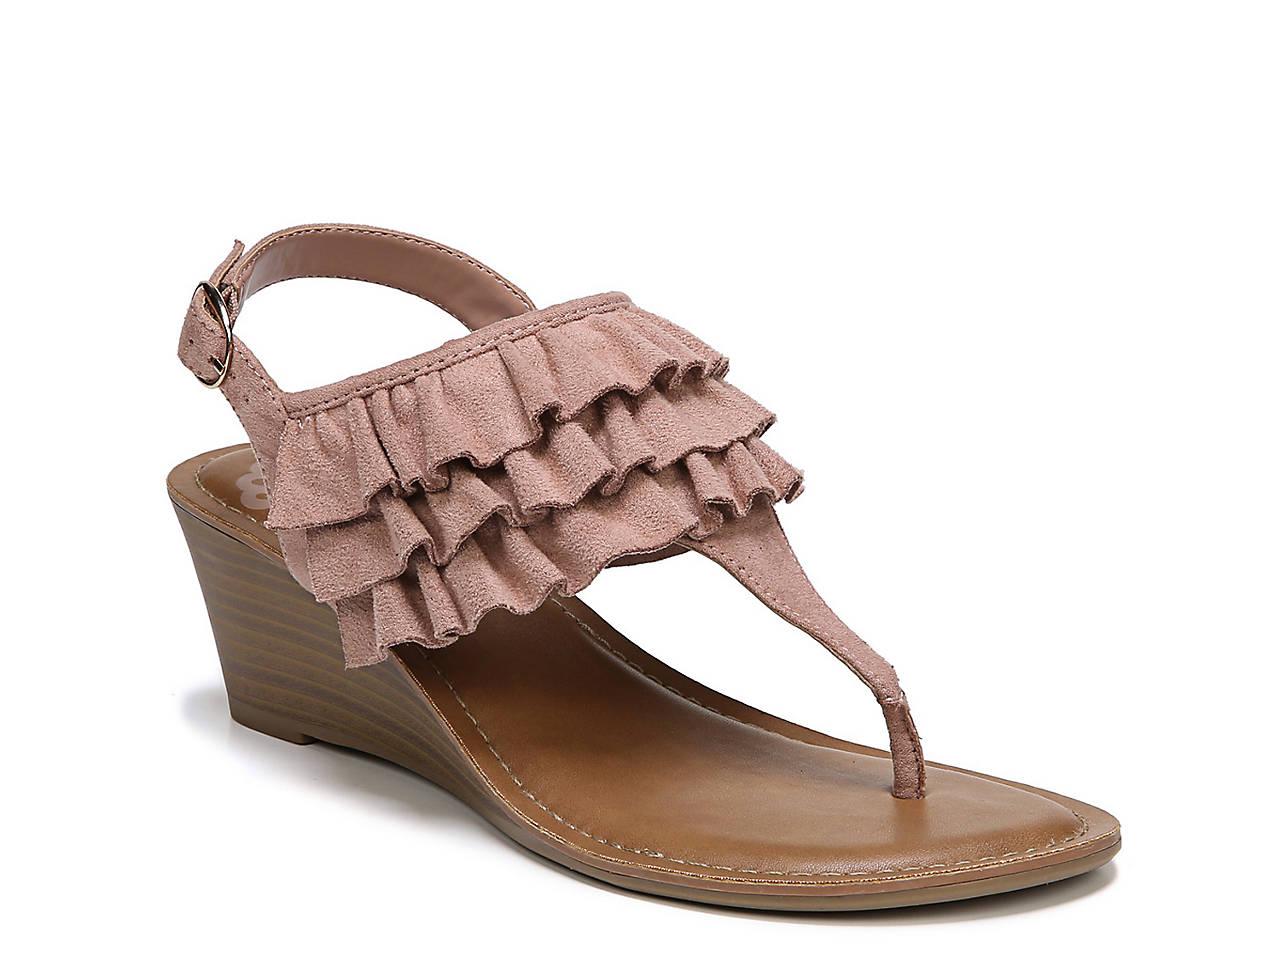 Fergalicious Swindle Women's ... Wedge Sandals jXa8adN